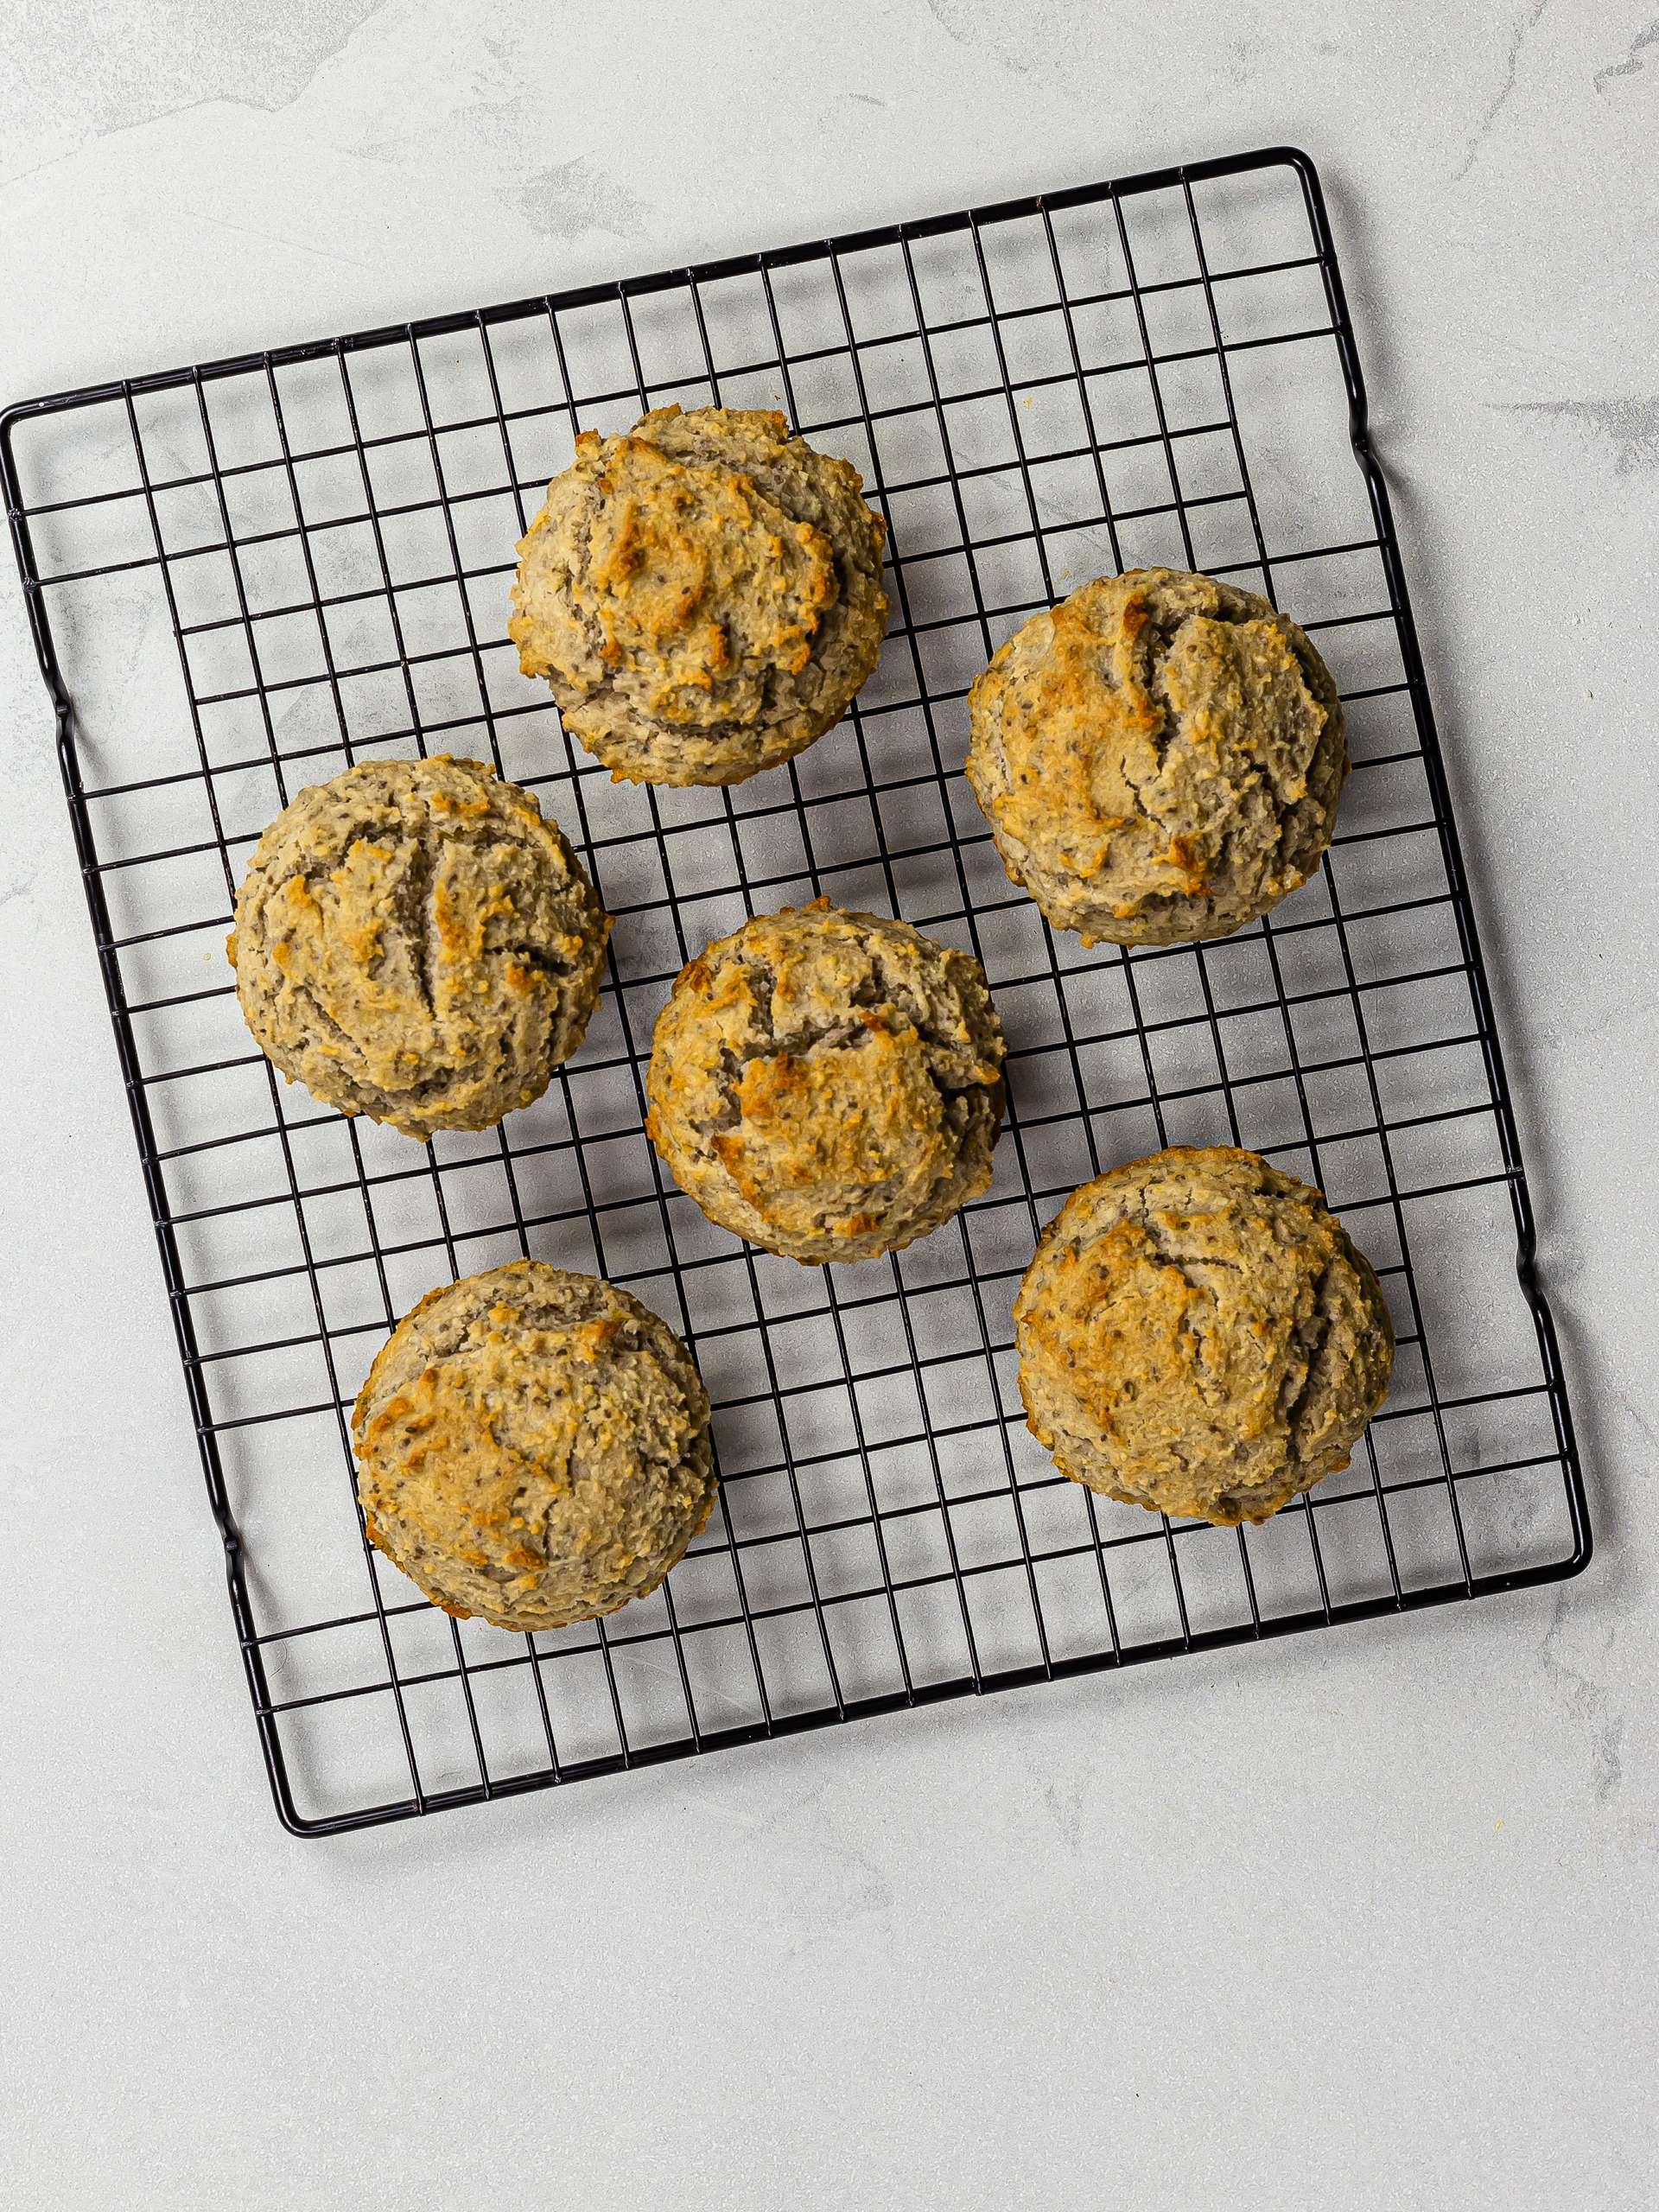 baked lemon chia muffins on a rack